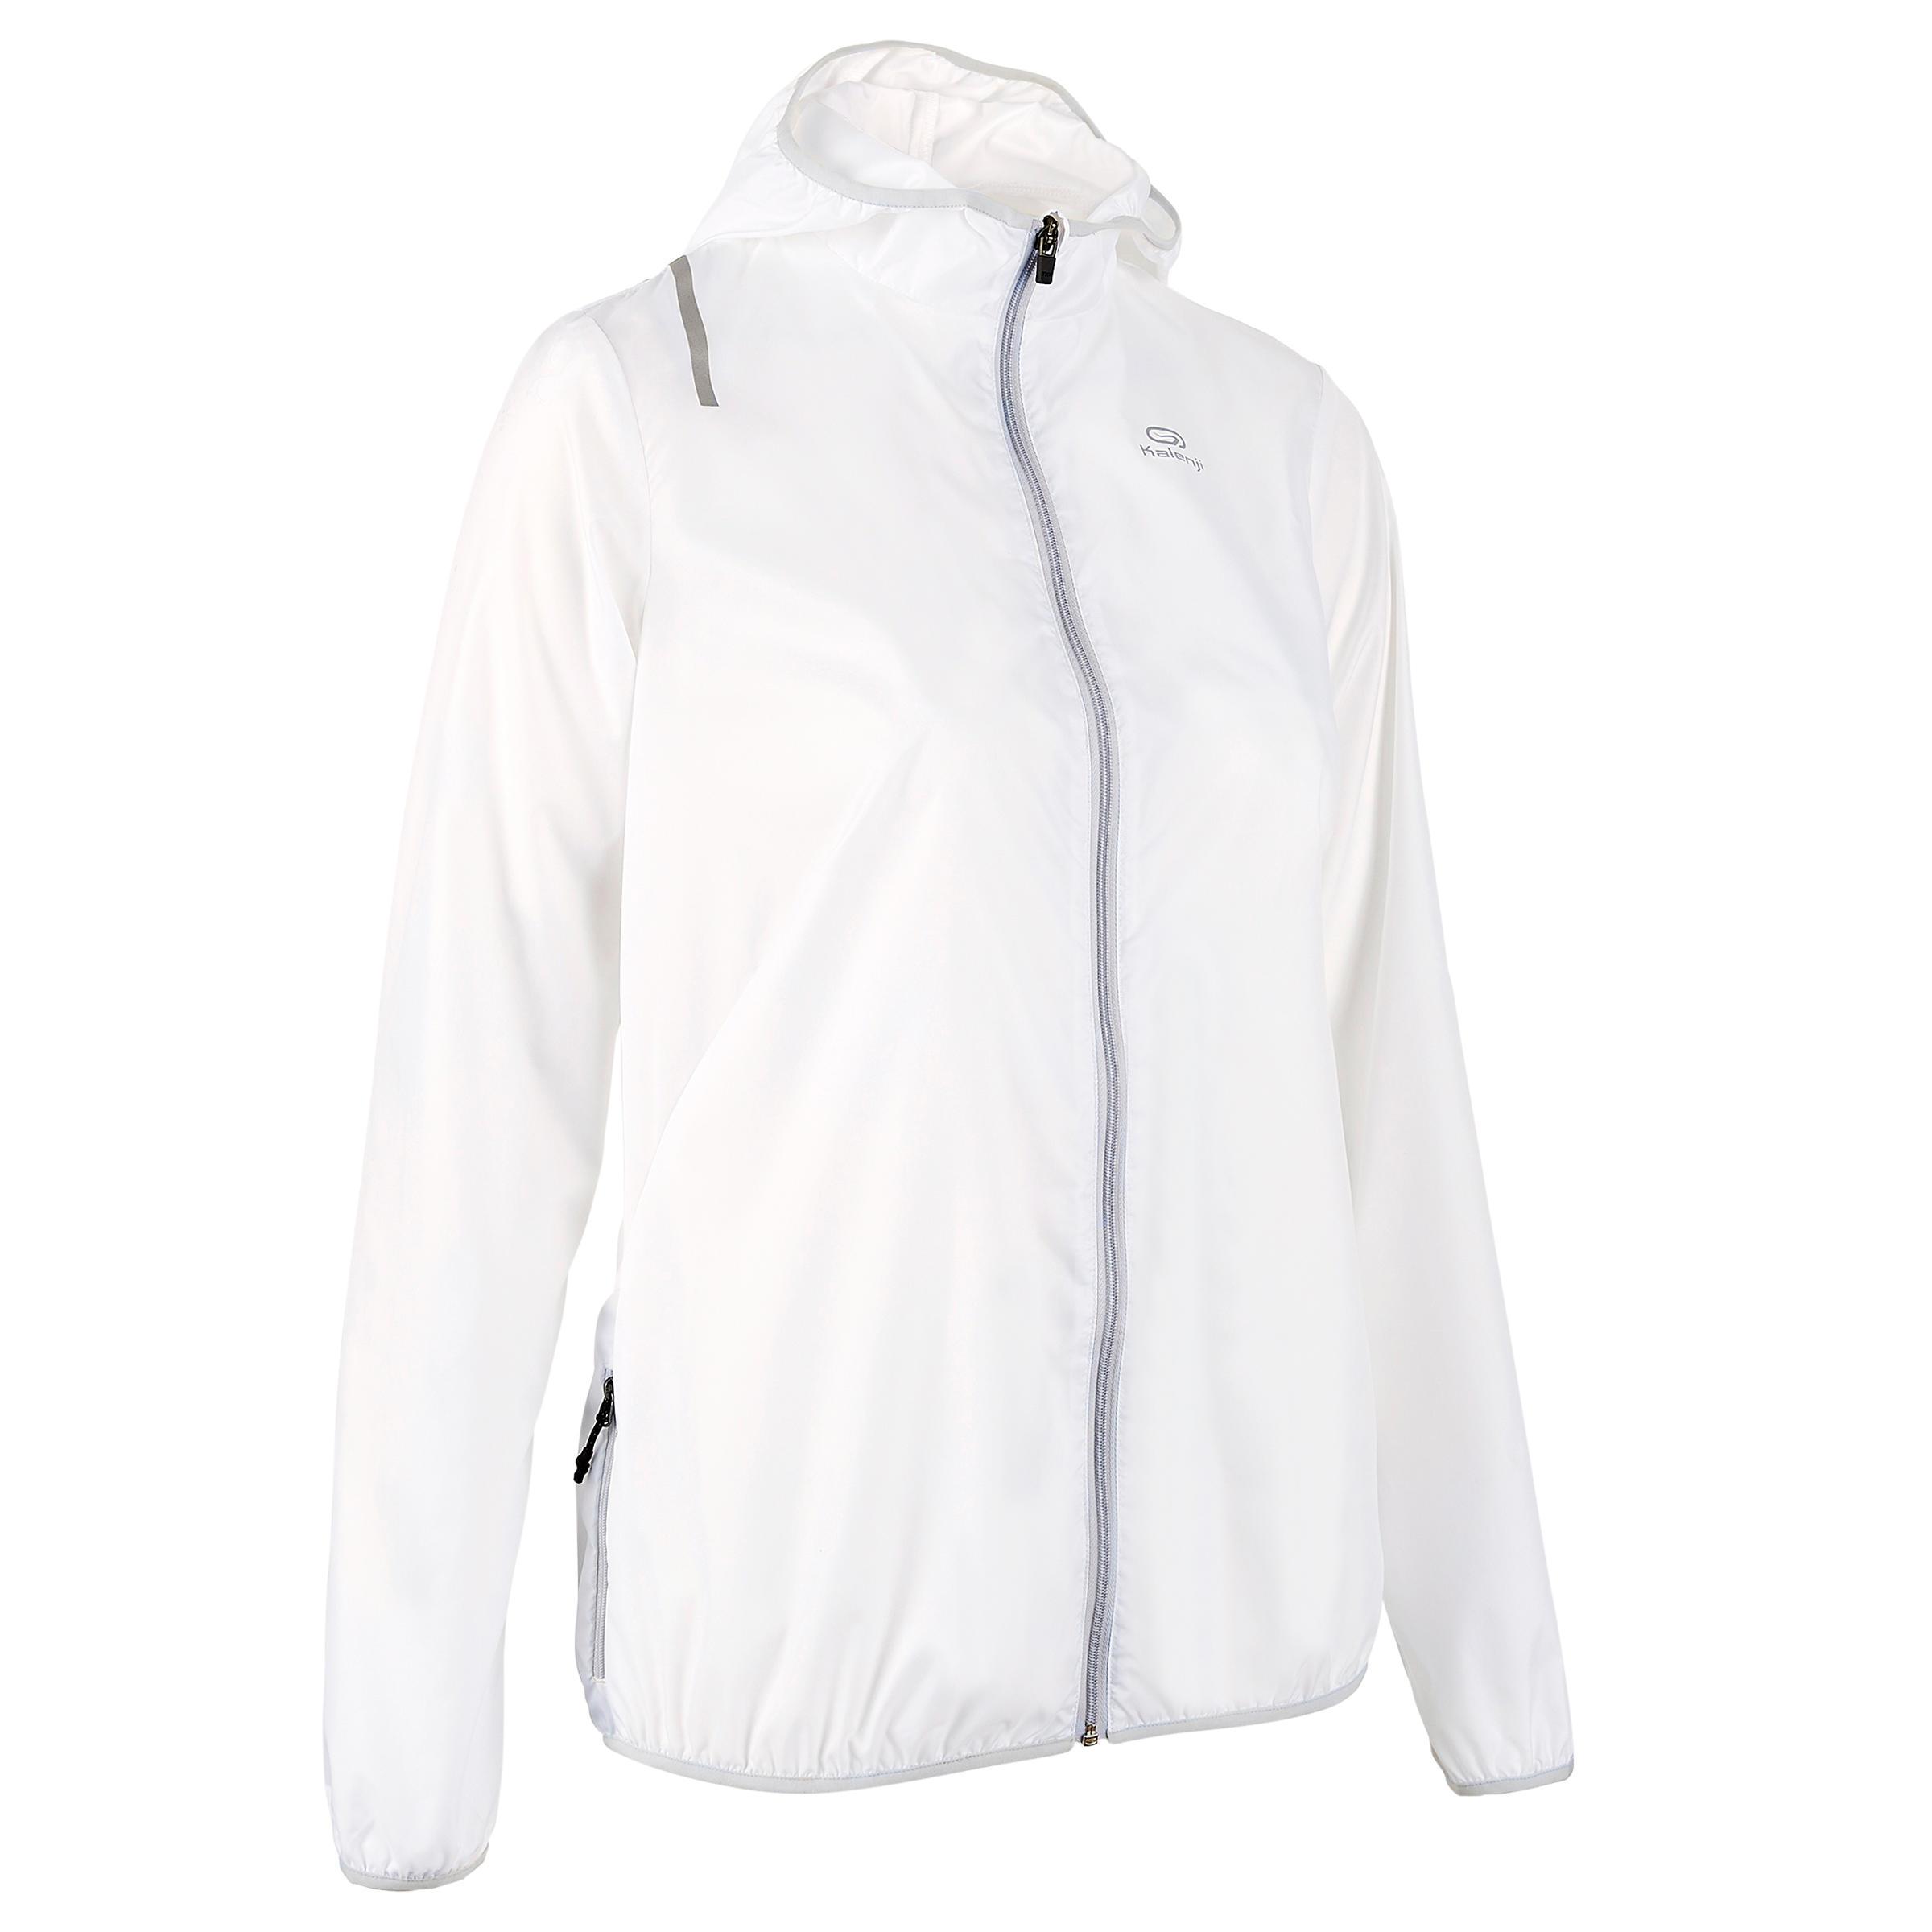 Laufjacke Run Wind Damen weiß | Sportbekleidung > Sportjacken > Laufjacken | Weiß - Grau - Blau | Kalenji